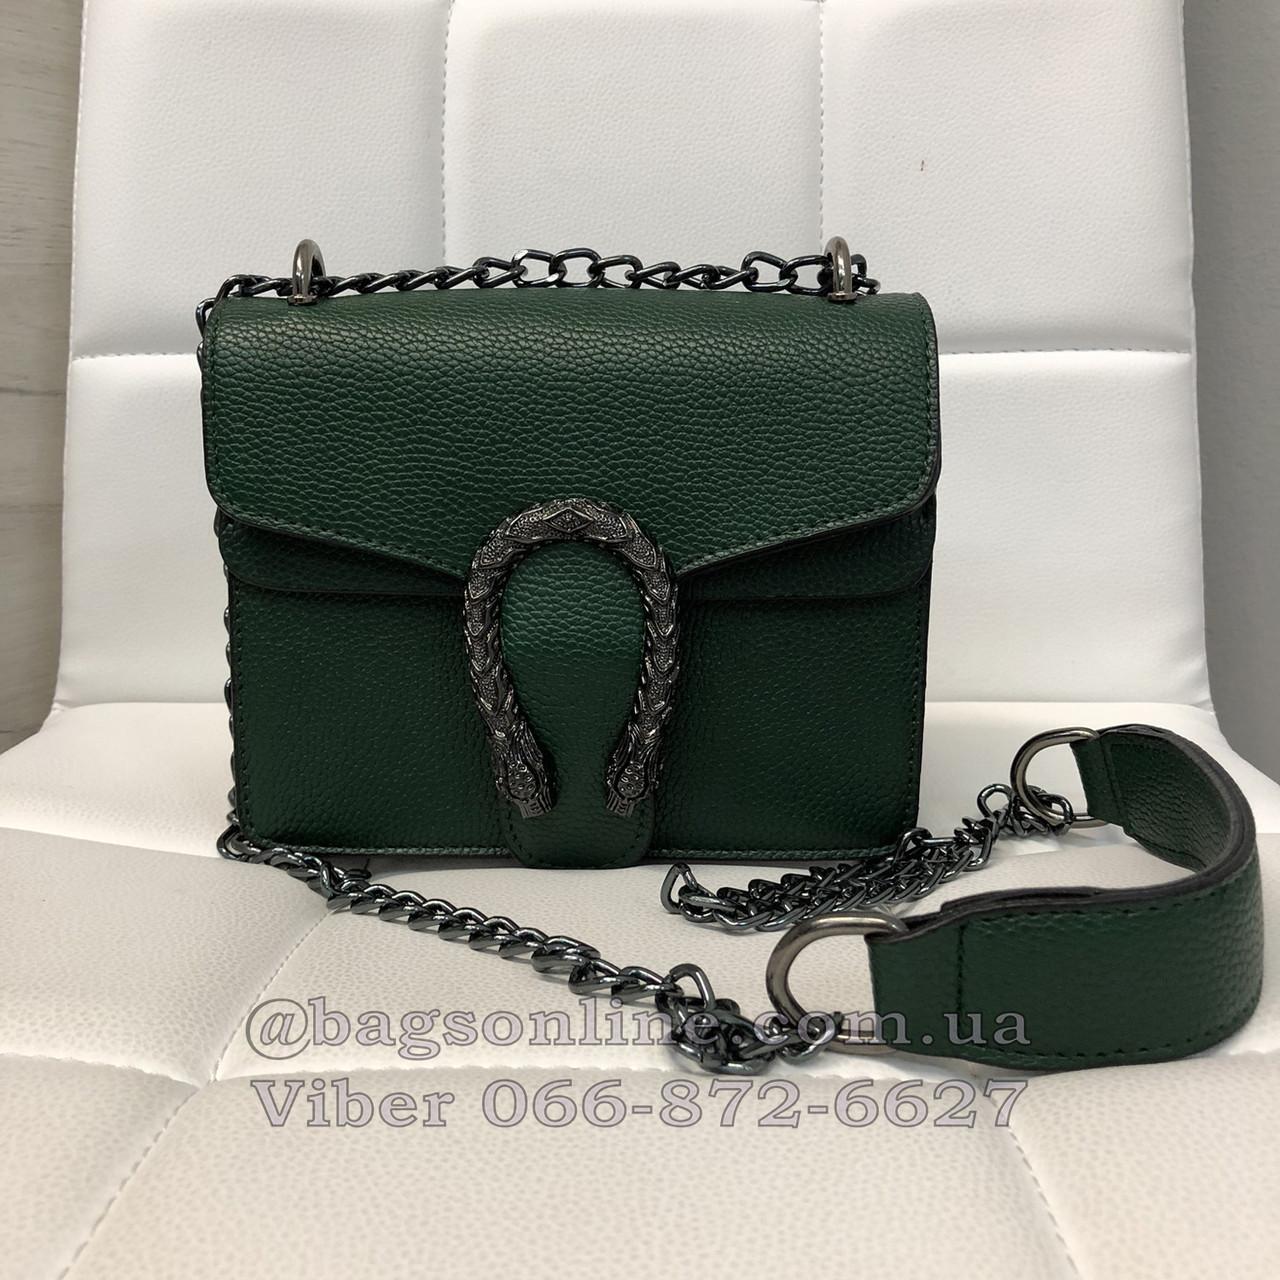 a87fcbc62fd2 Сумка в стиле Gucci с подковой | сумка реплика Гуччи | Гучи с подковой  Зеленый